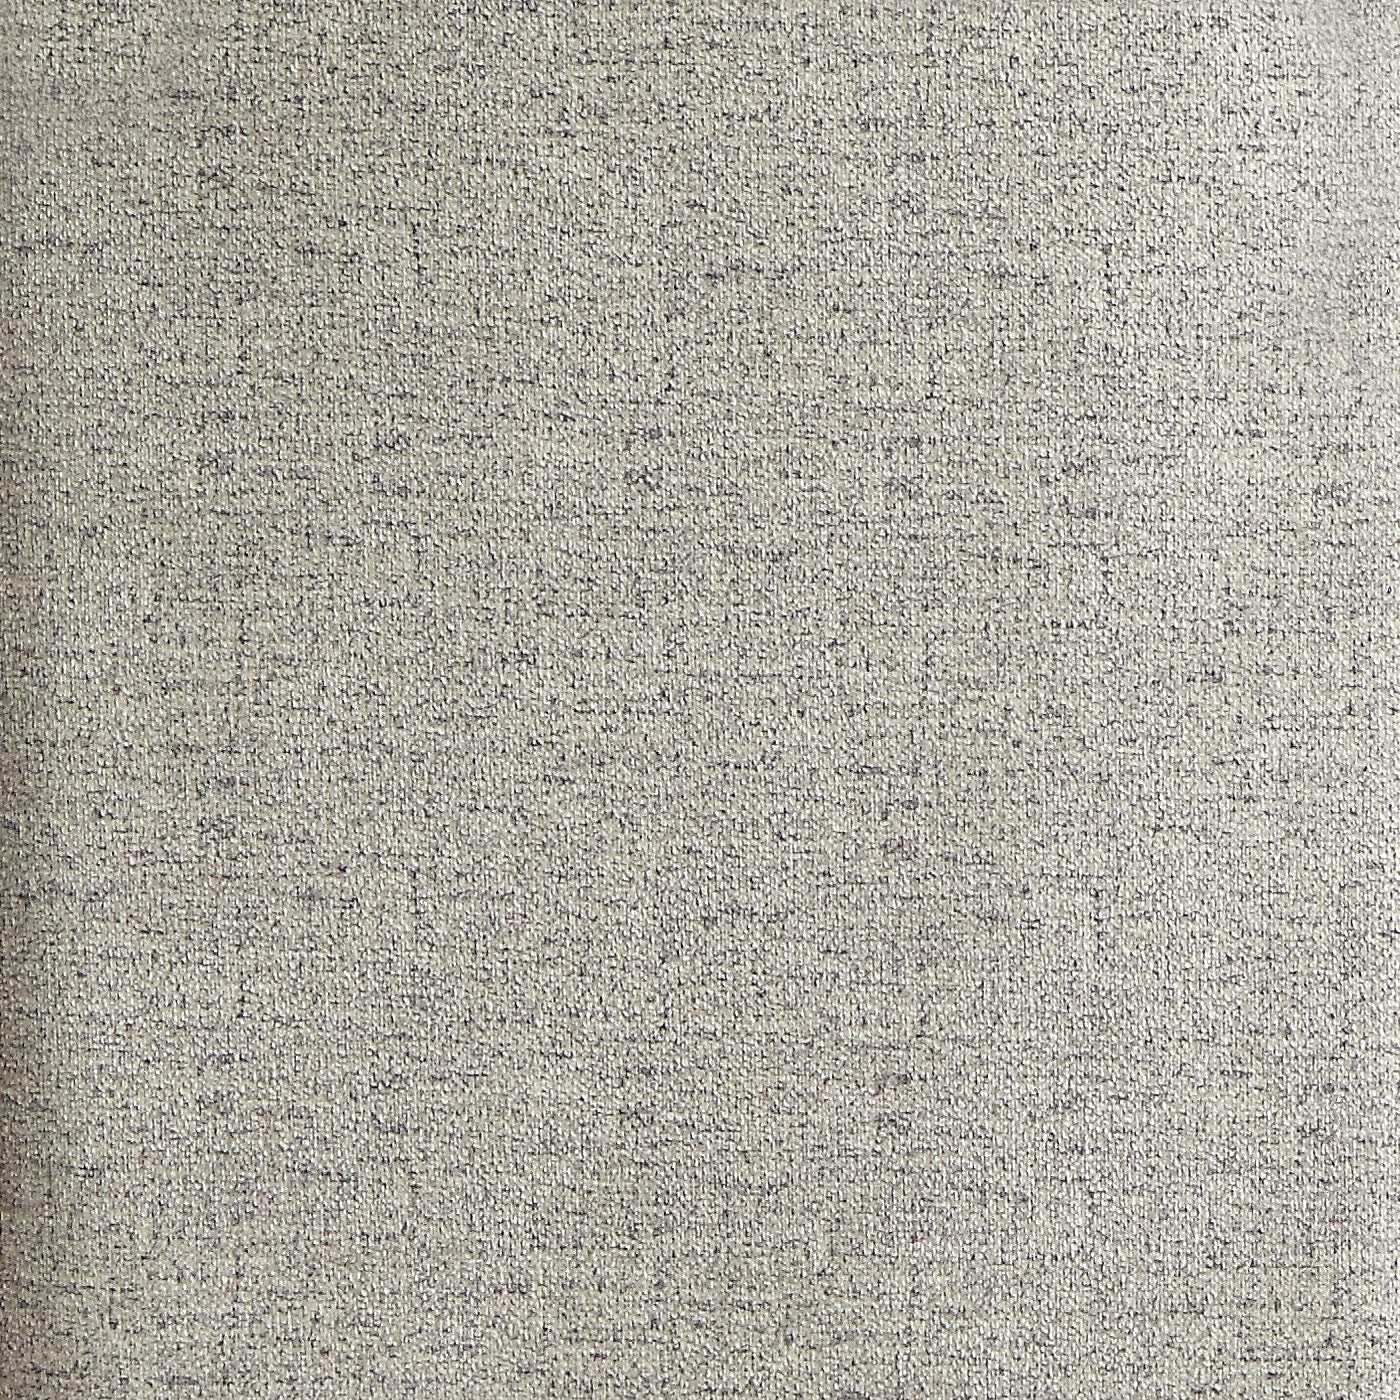 Light Gray 52 W HOMAF Homelegance Fabric Upholstered Dining Bench